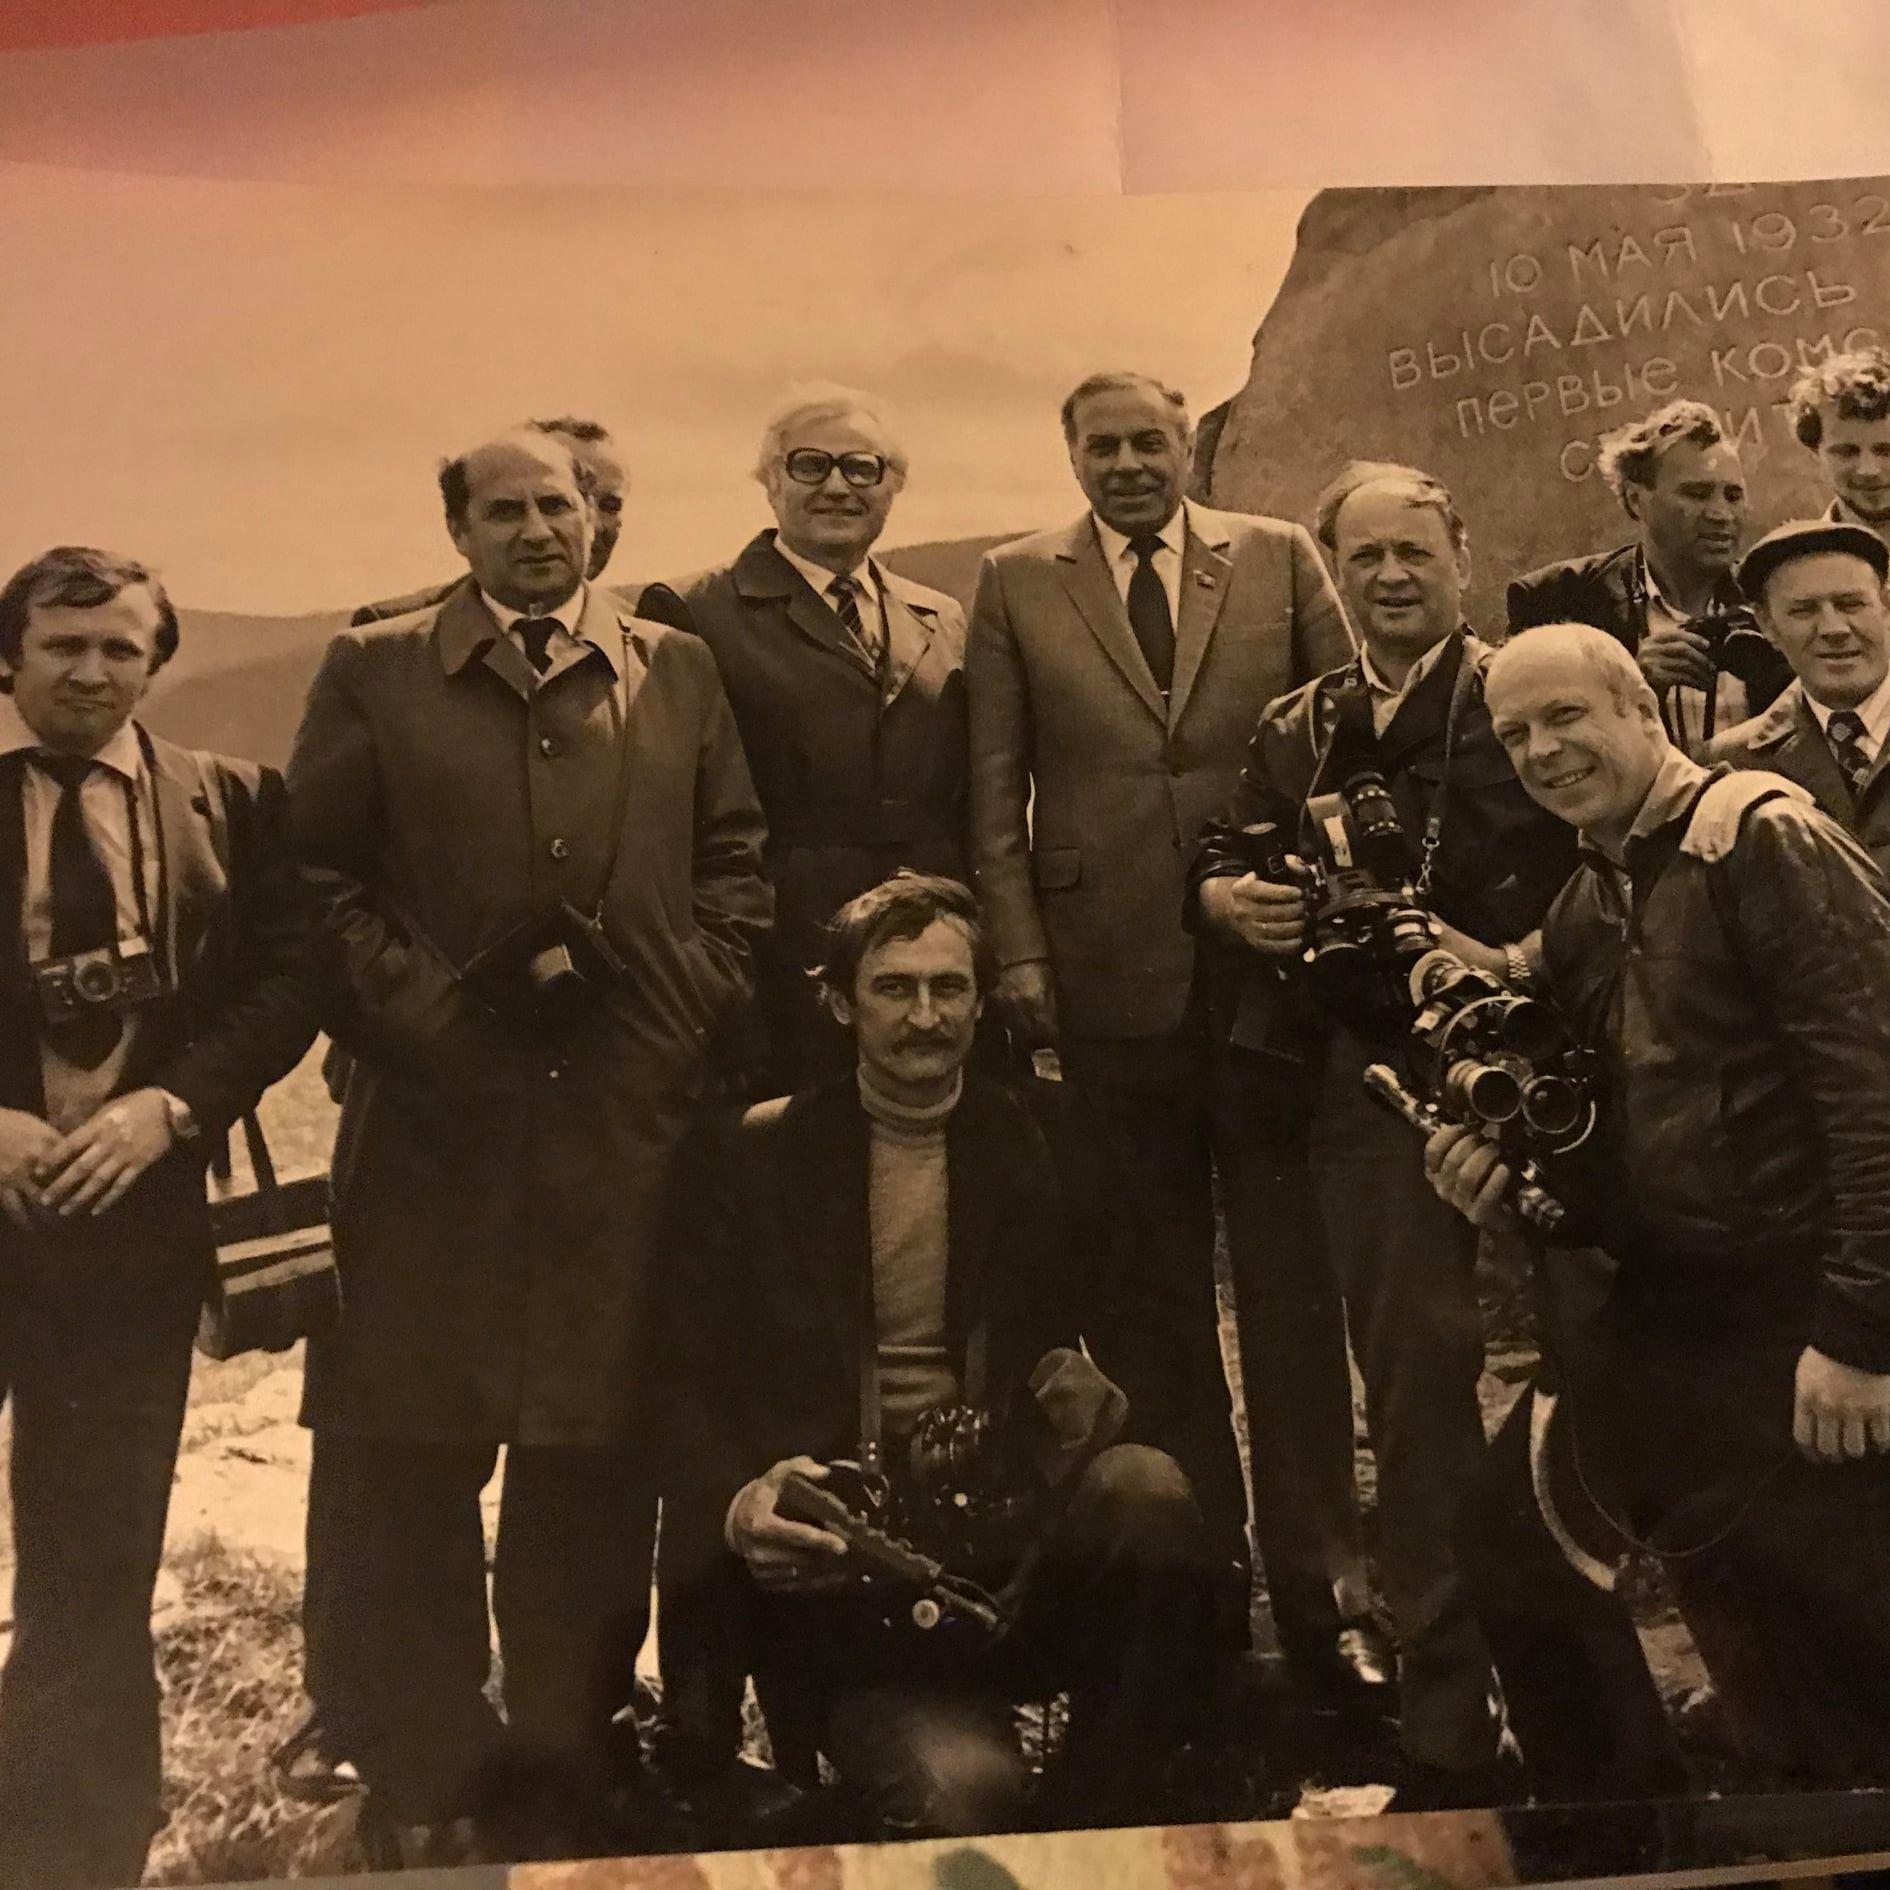 Экспонат #18. С Гейдаром Алиевым. БАМ, Комсомольск-на-Амуре. 1984 год